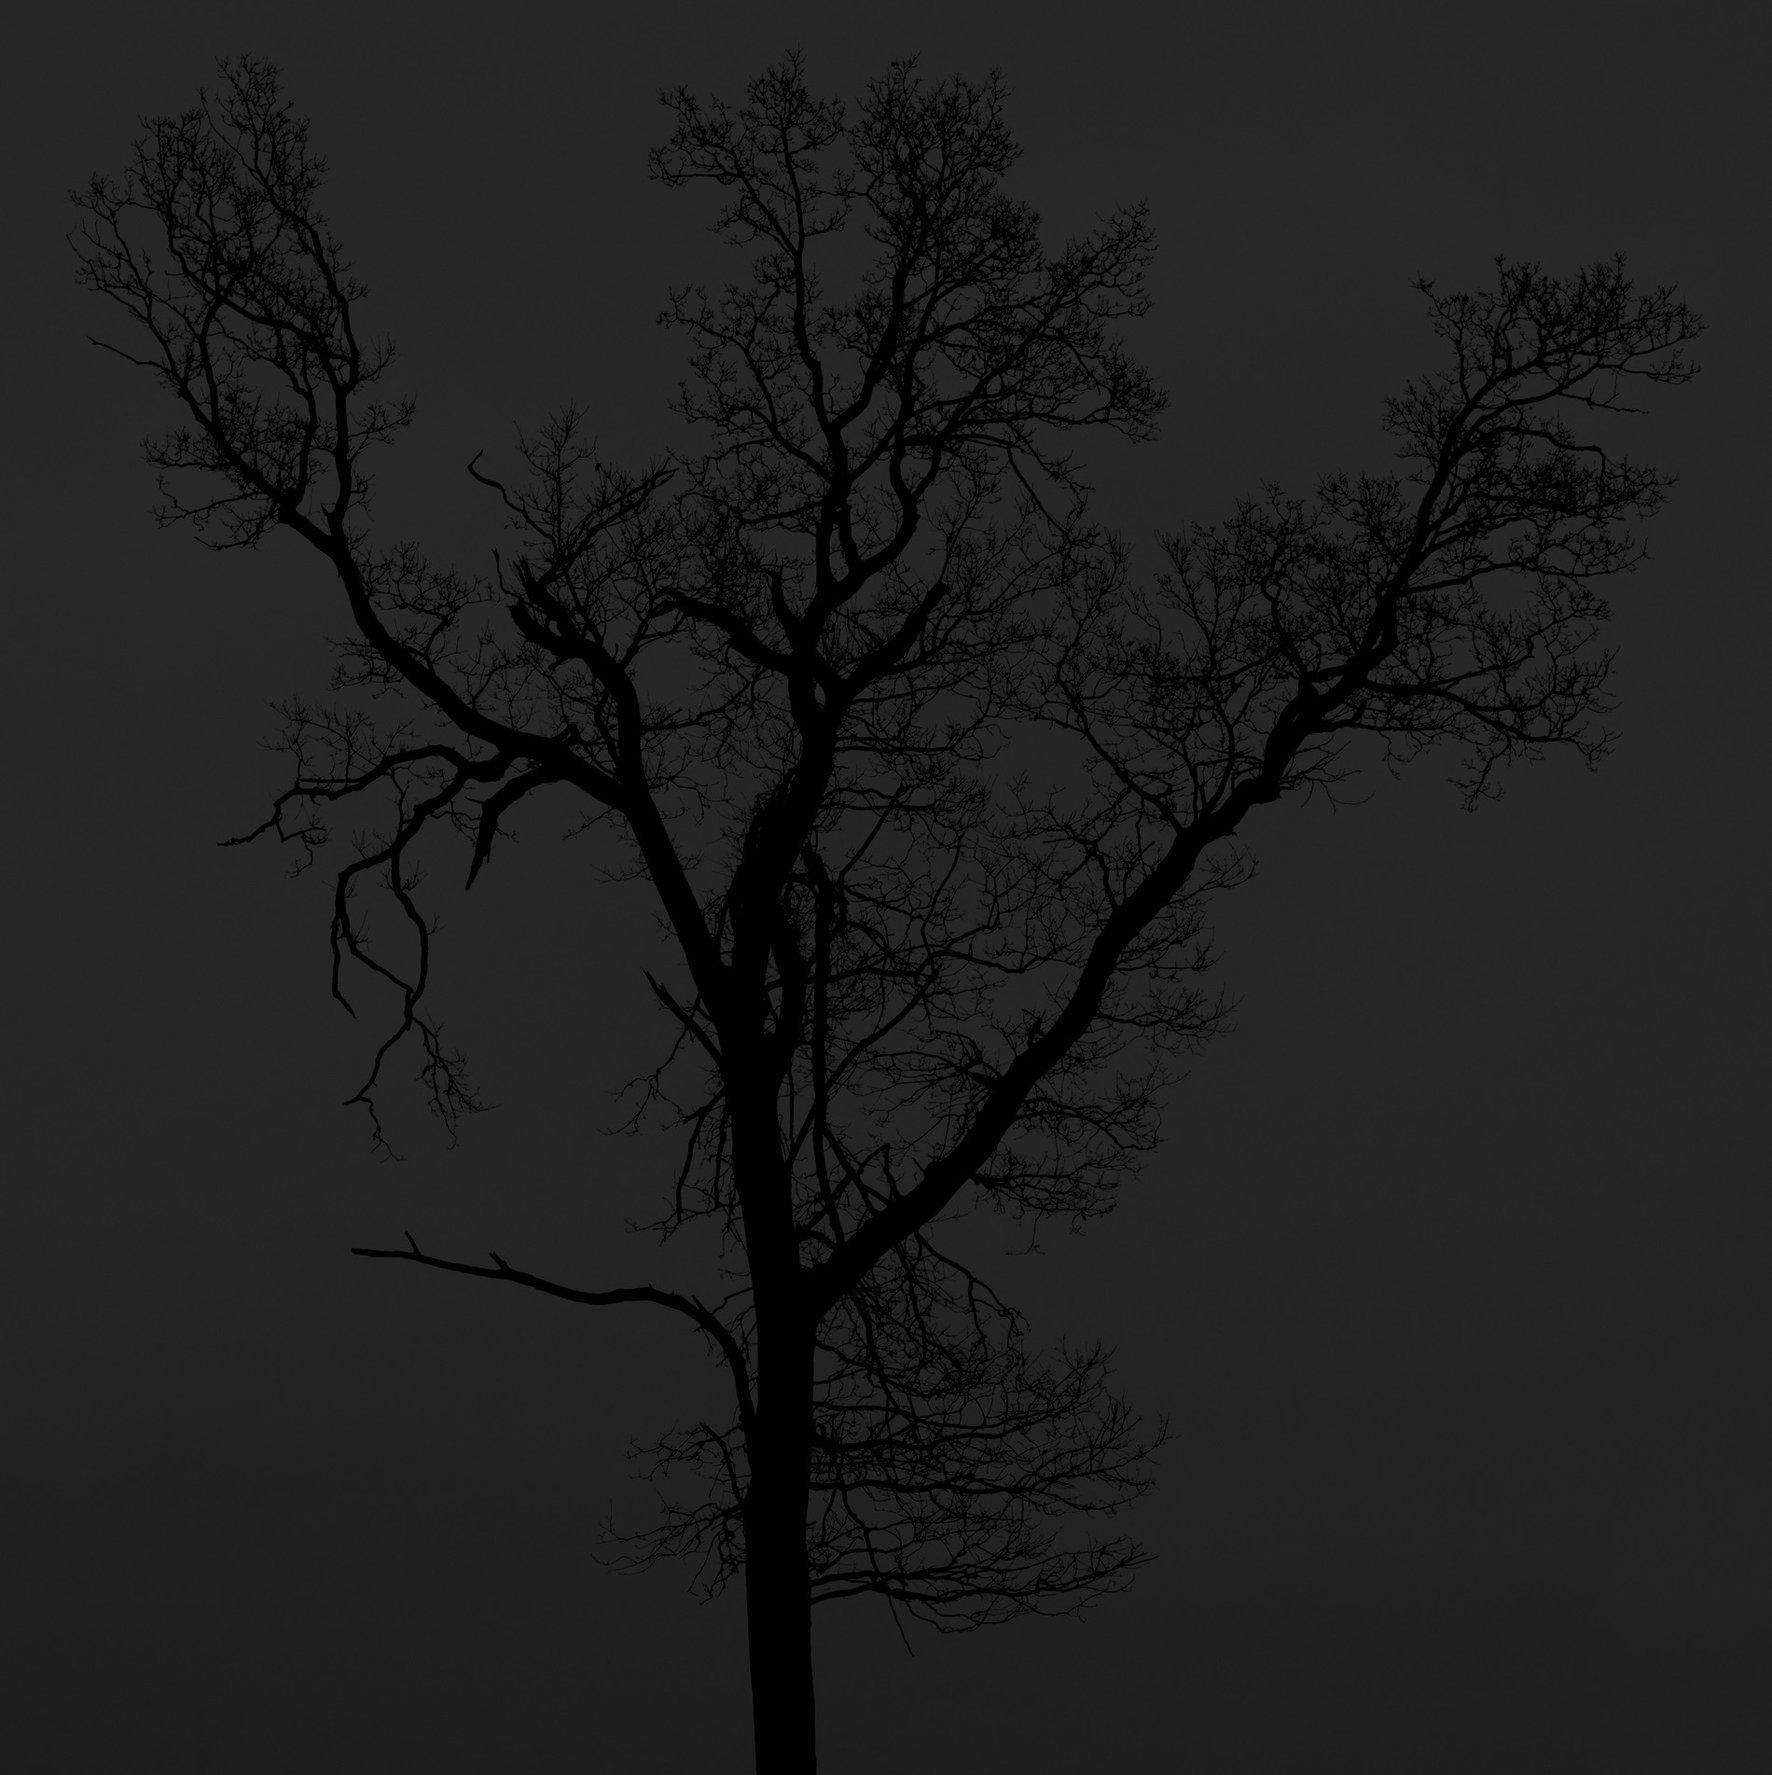 Black-dark-trees-winter-woods-black-white-copyright-photographer-Kenneth-Rimm-9b.jpg